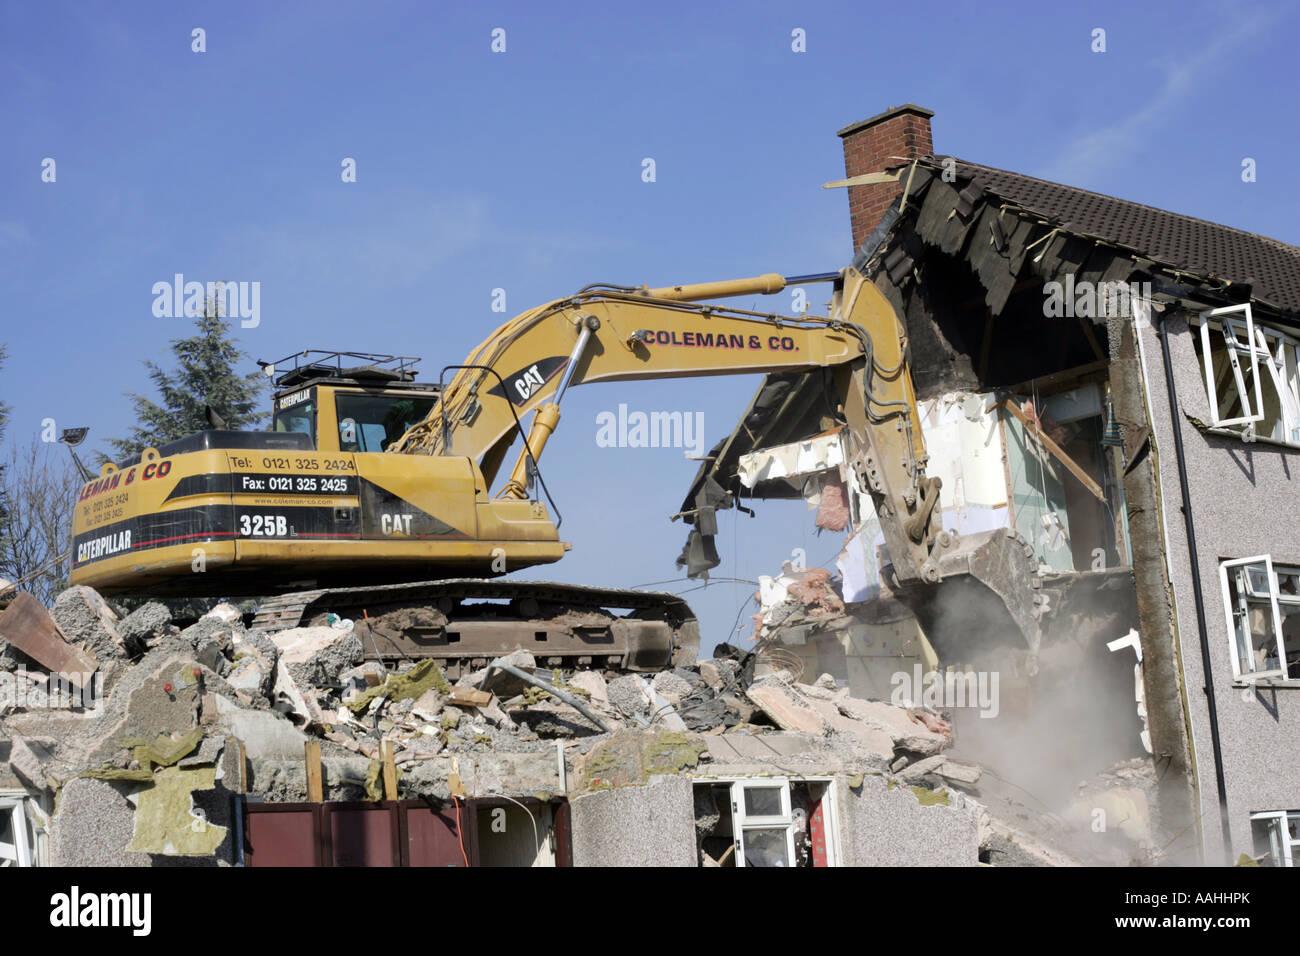 A bulldozer demolishing old council houses in Ley Hill, Northfield, Birmingham, England. - Stock Image